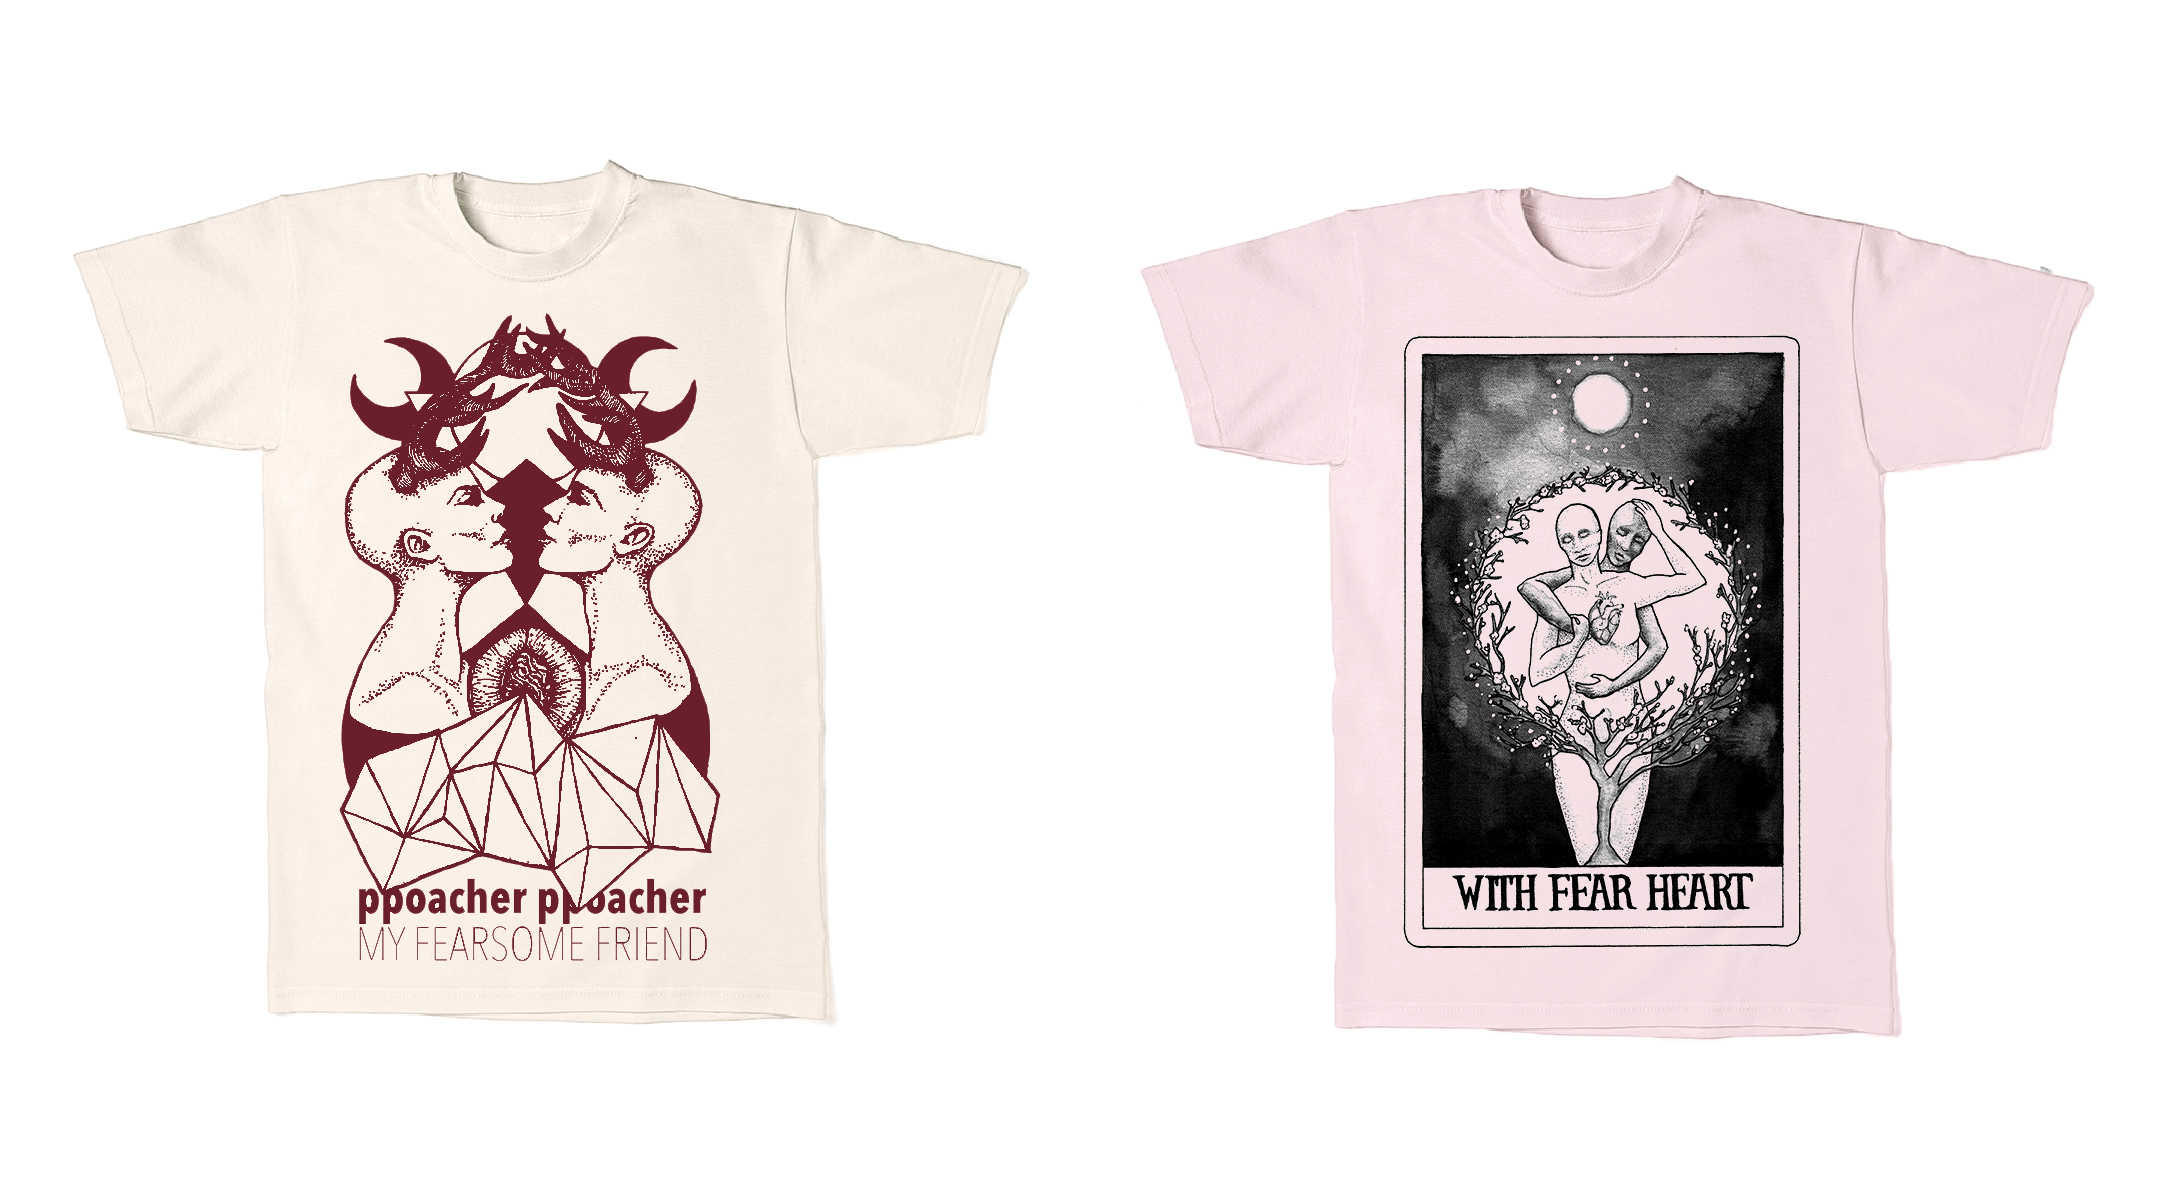 ppoach-shirts-2.jpg